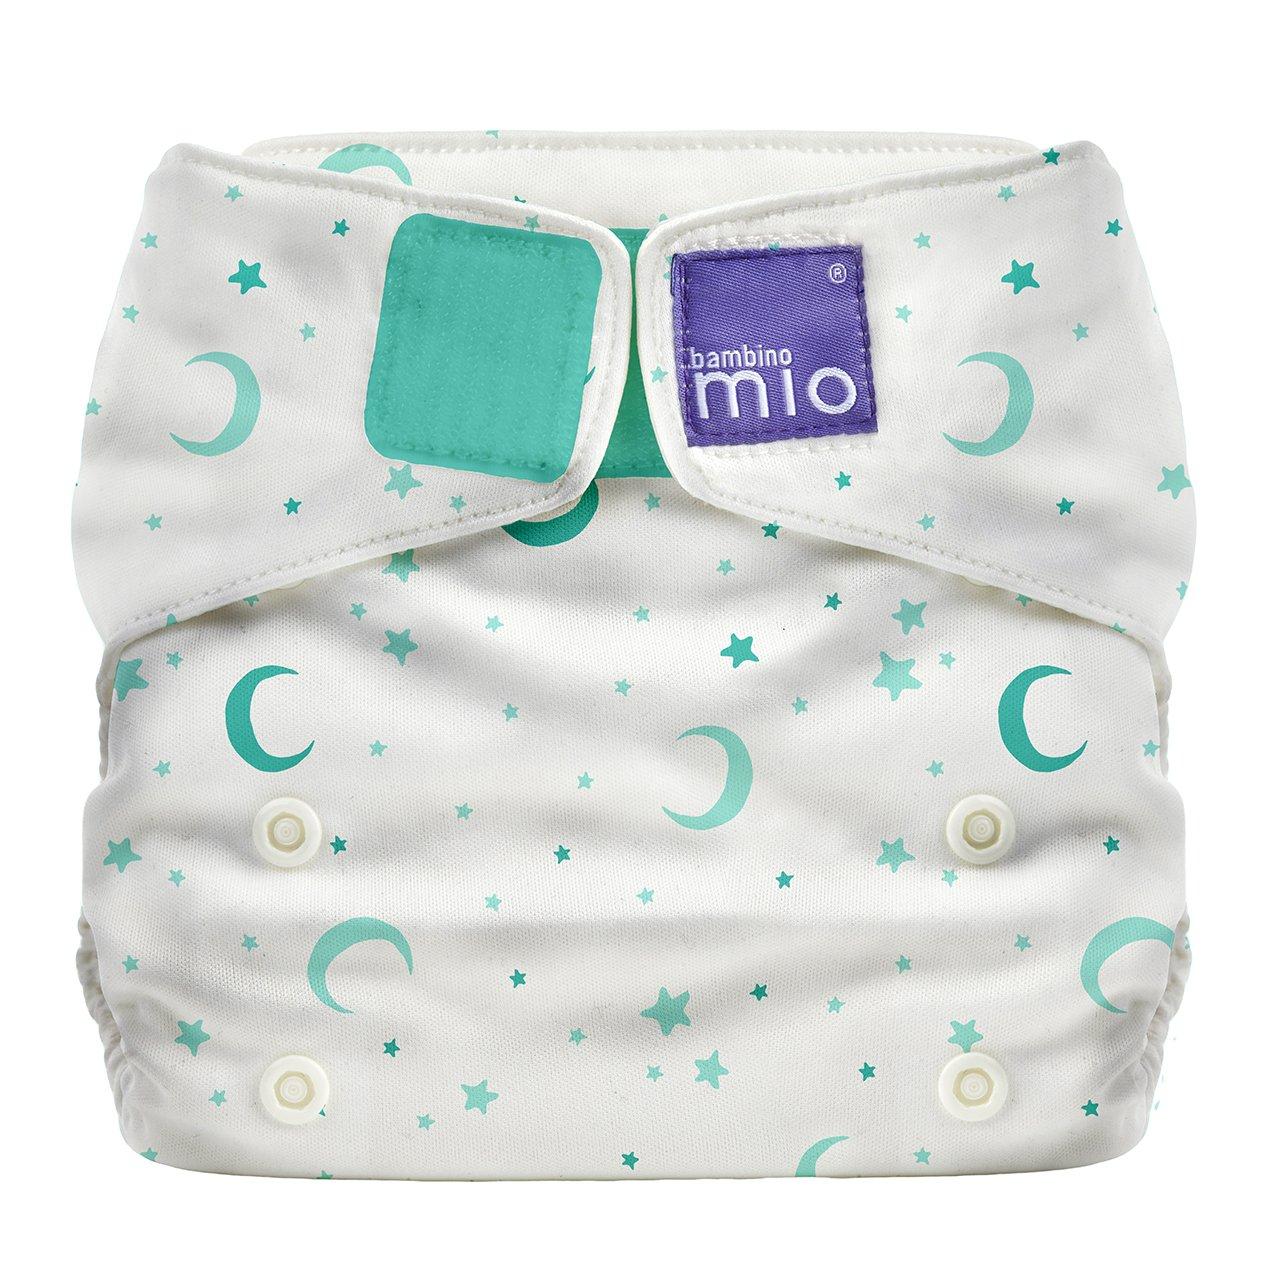 Dragonfly Daze Bambino Mio Miosolo All-In-One Cloth Diaper